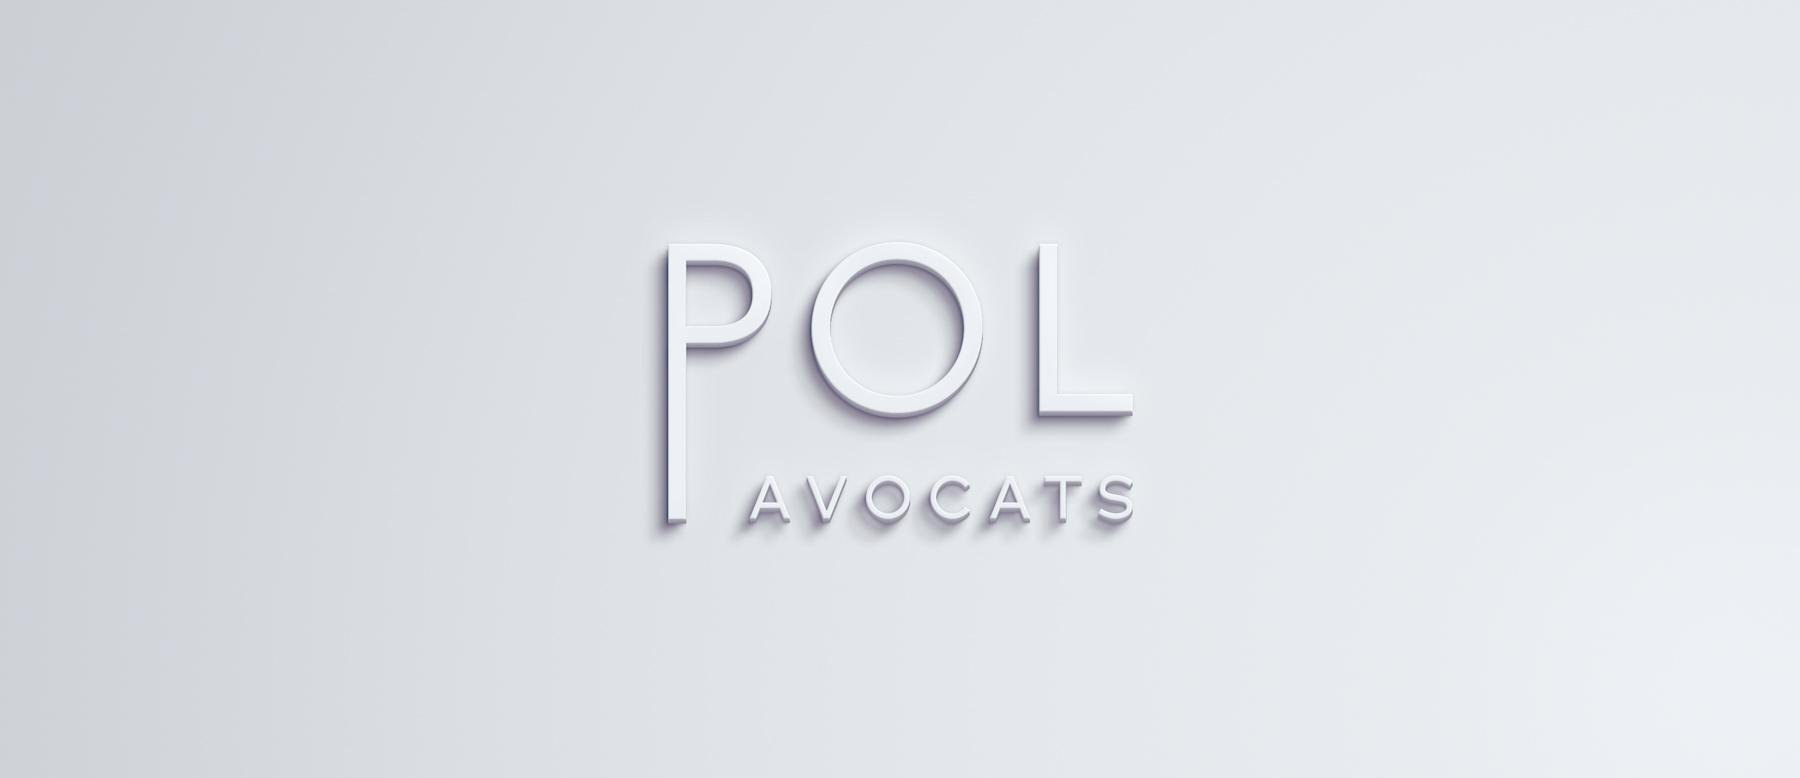 Cabinet POL Avocats